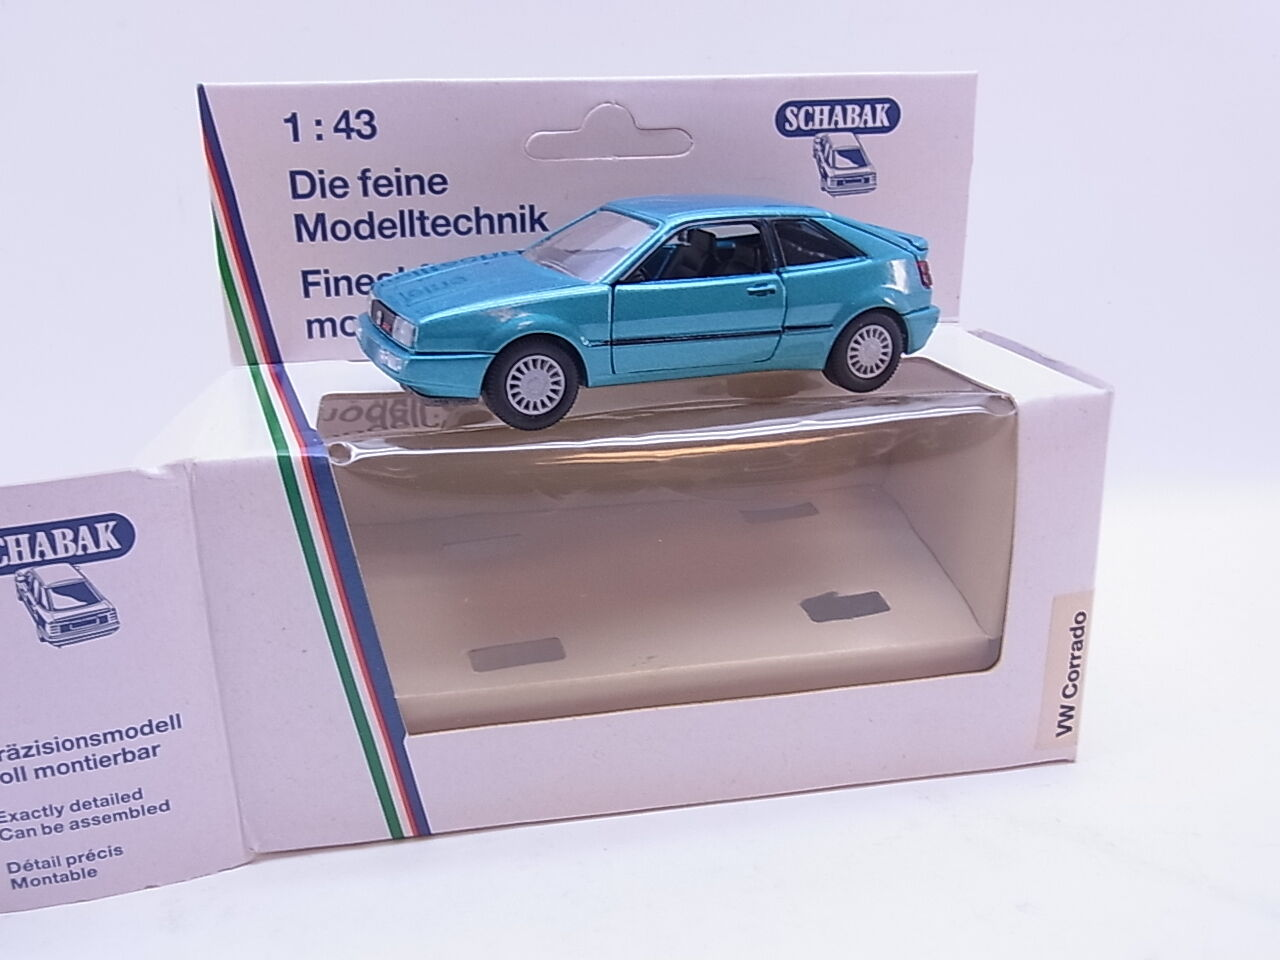 Lot 40673   SCHABAK 1018 VW Corrado vert metallic 1 43 voiture miniature nouveau dans neuf dans sa boîte